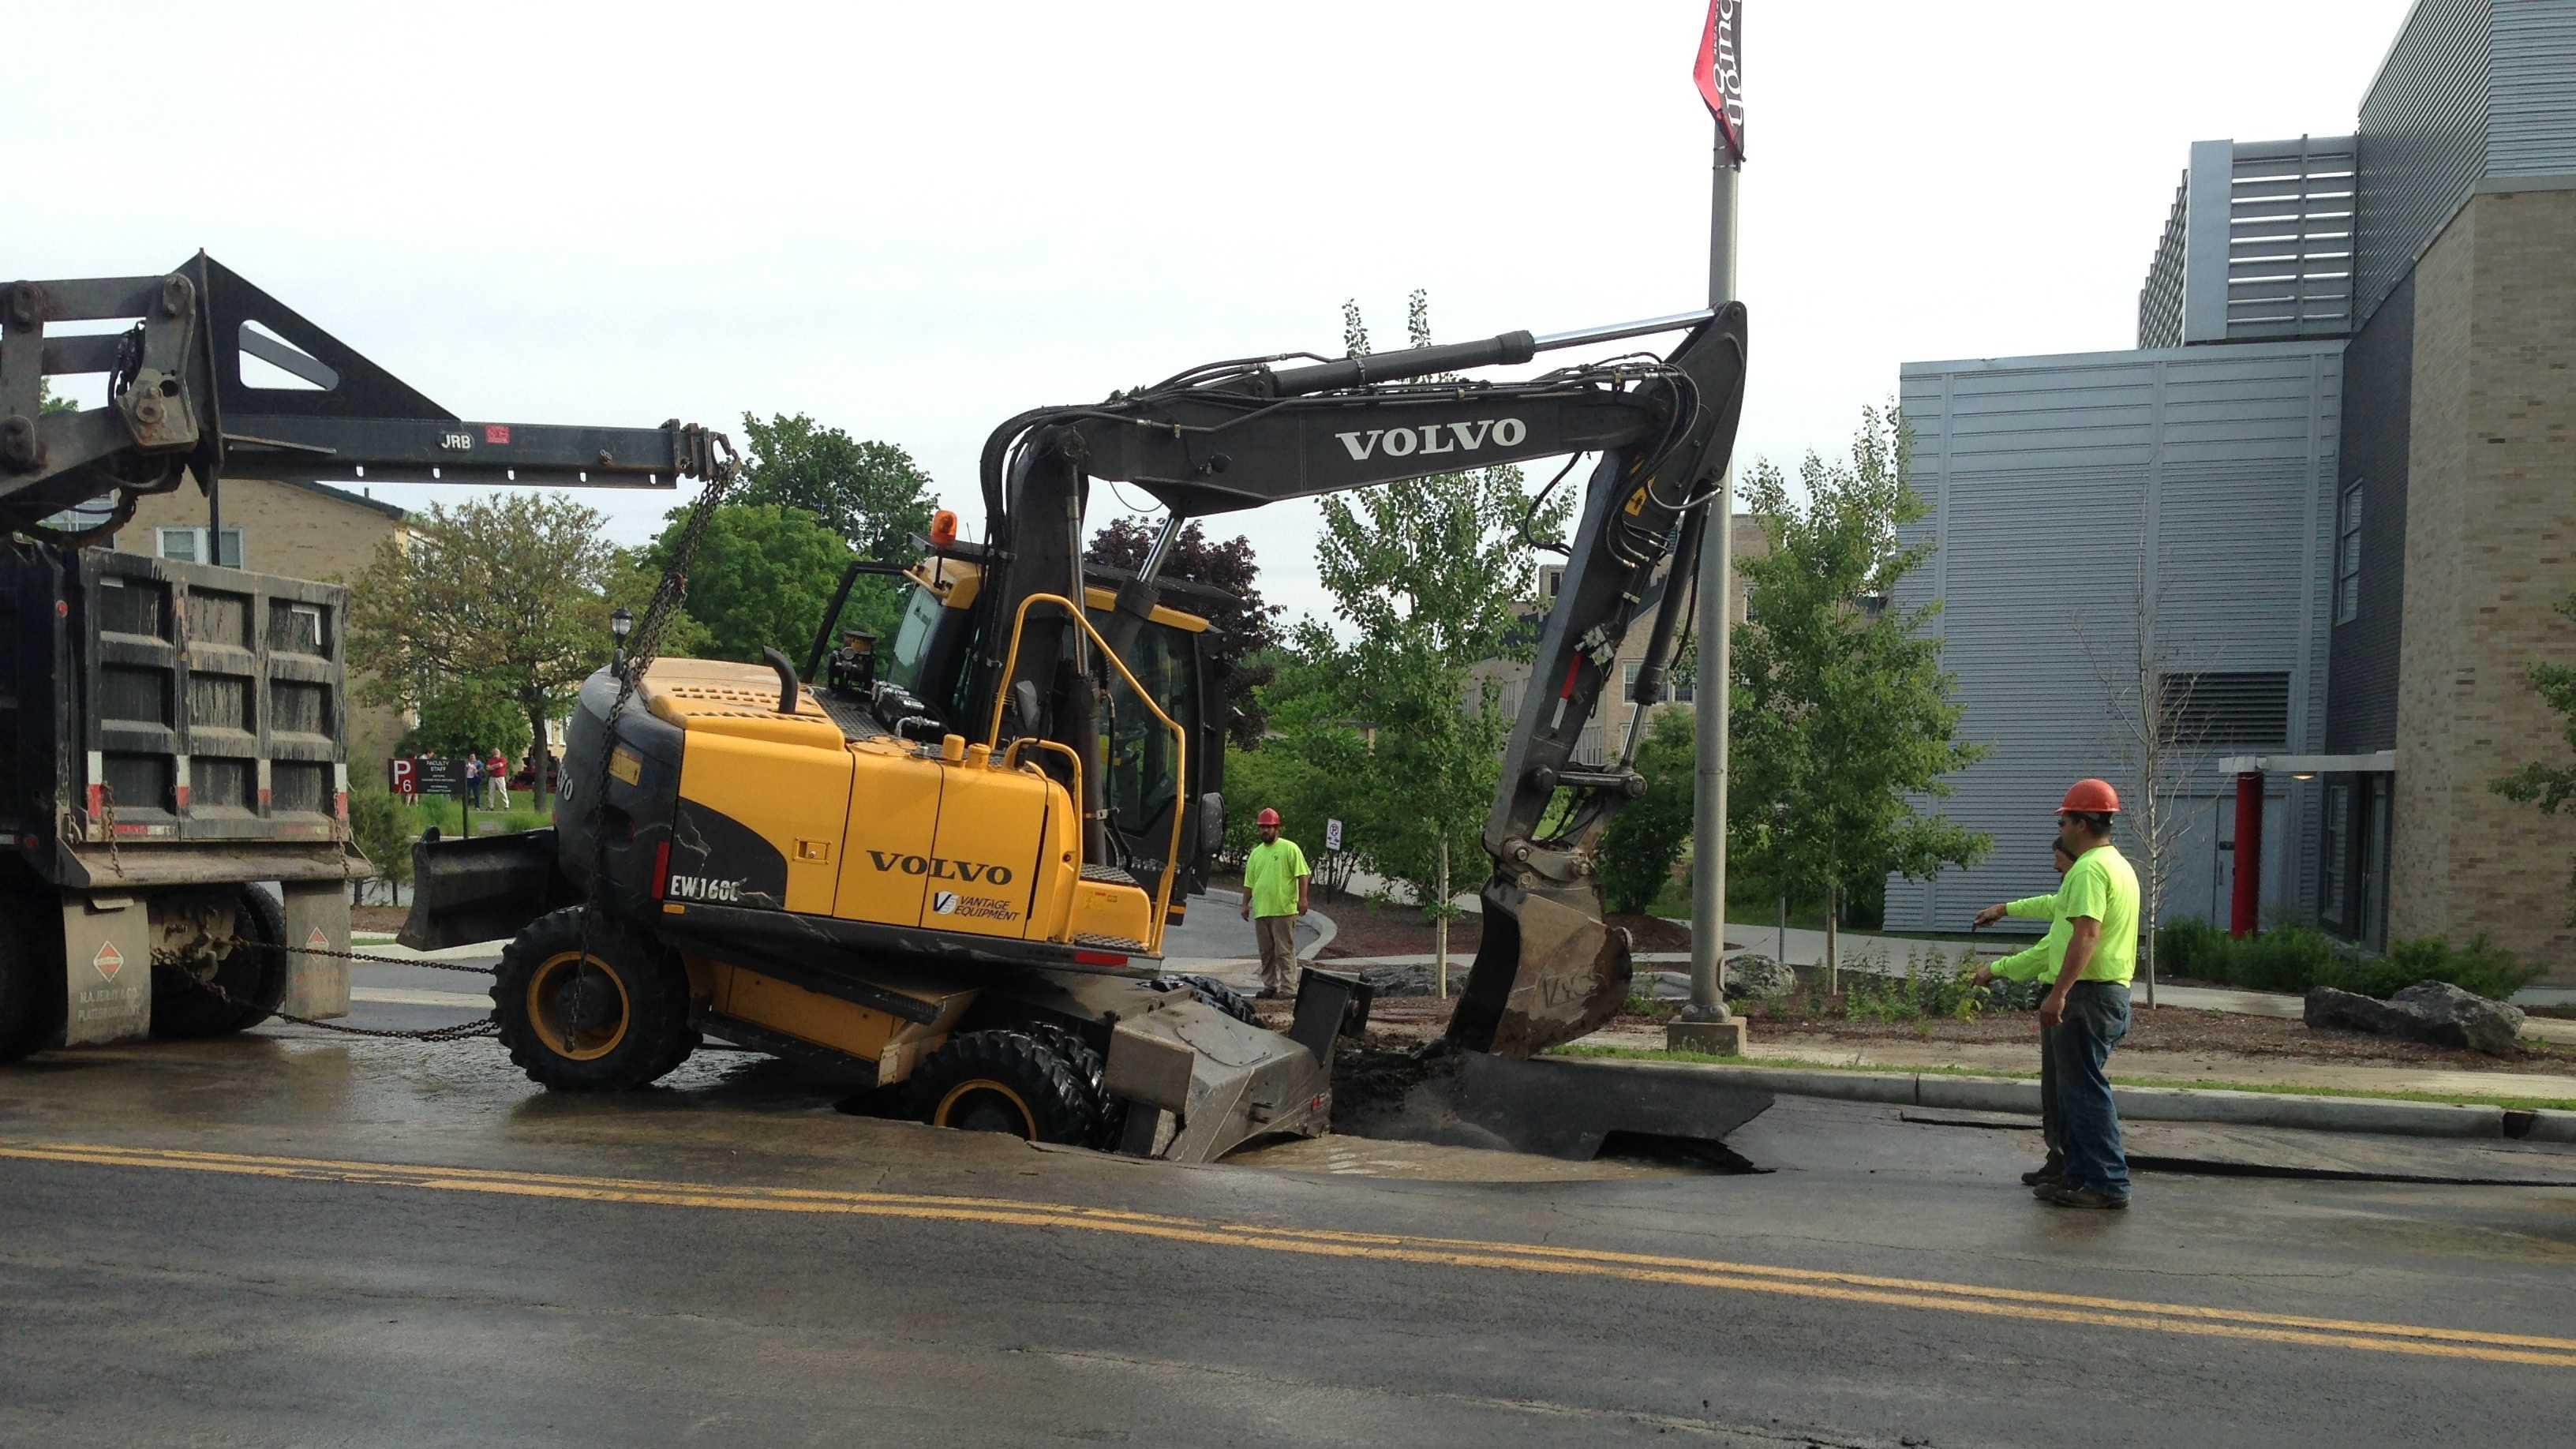 06-10-13 Plattsburgh street closed after water main break - img